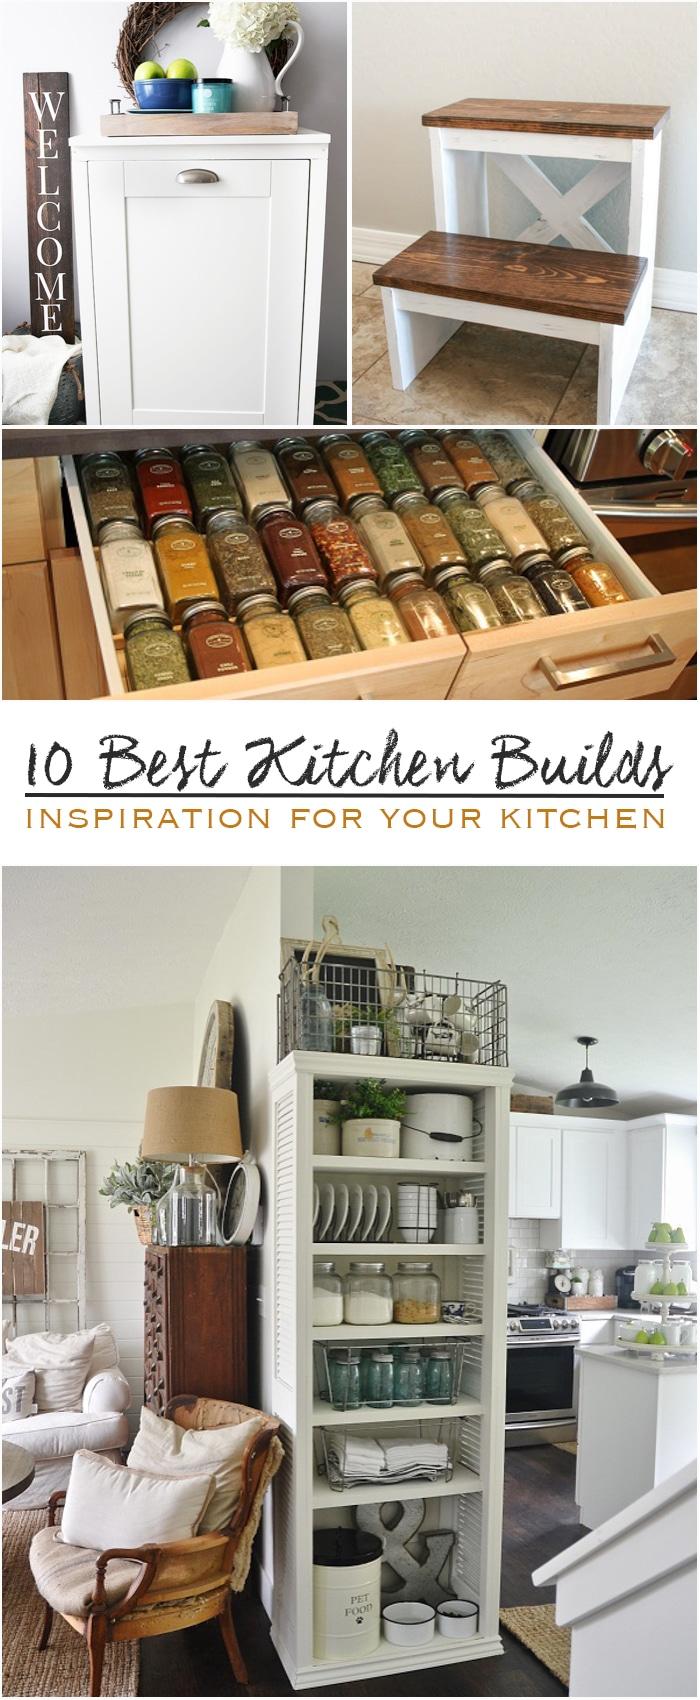 10 Best Kitchen Builds via OEH